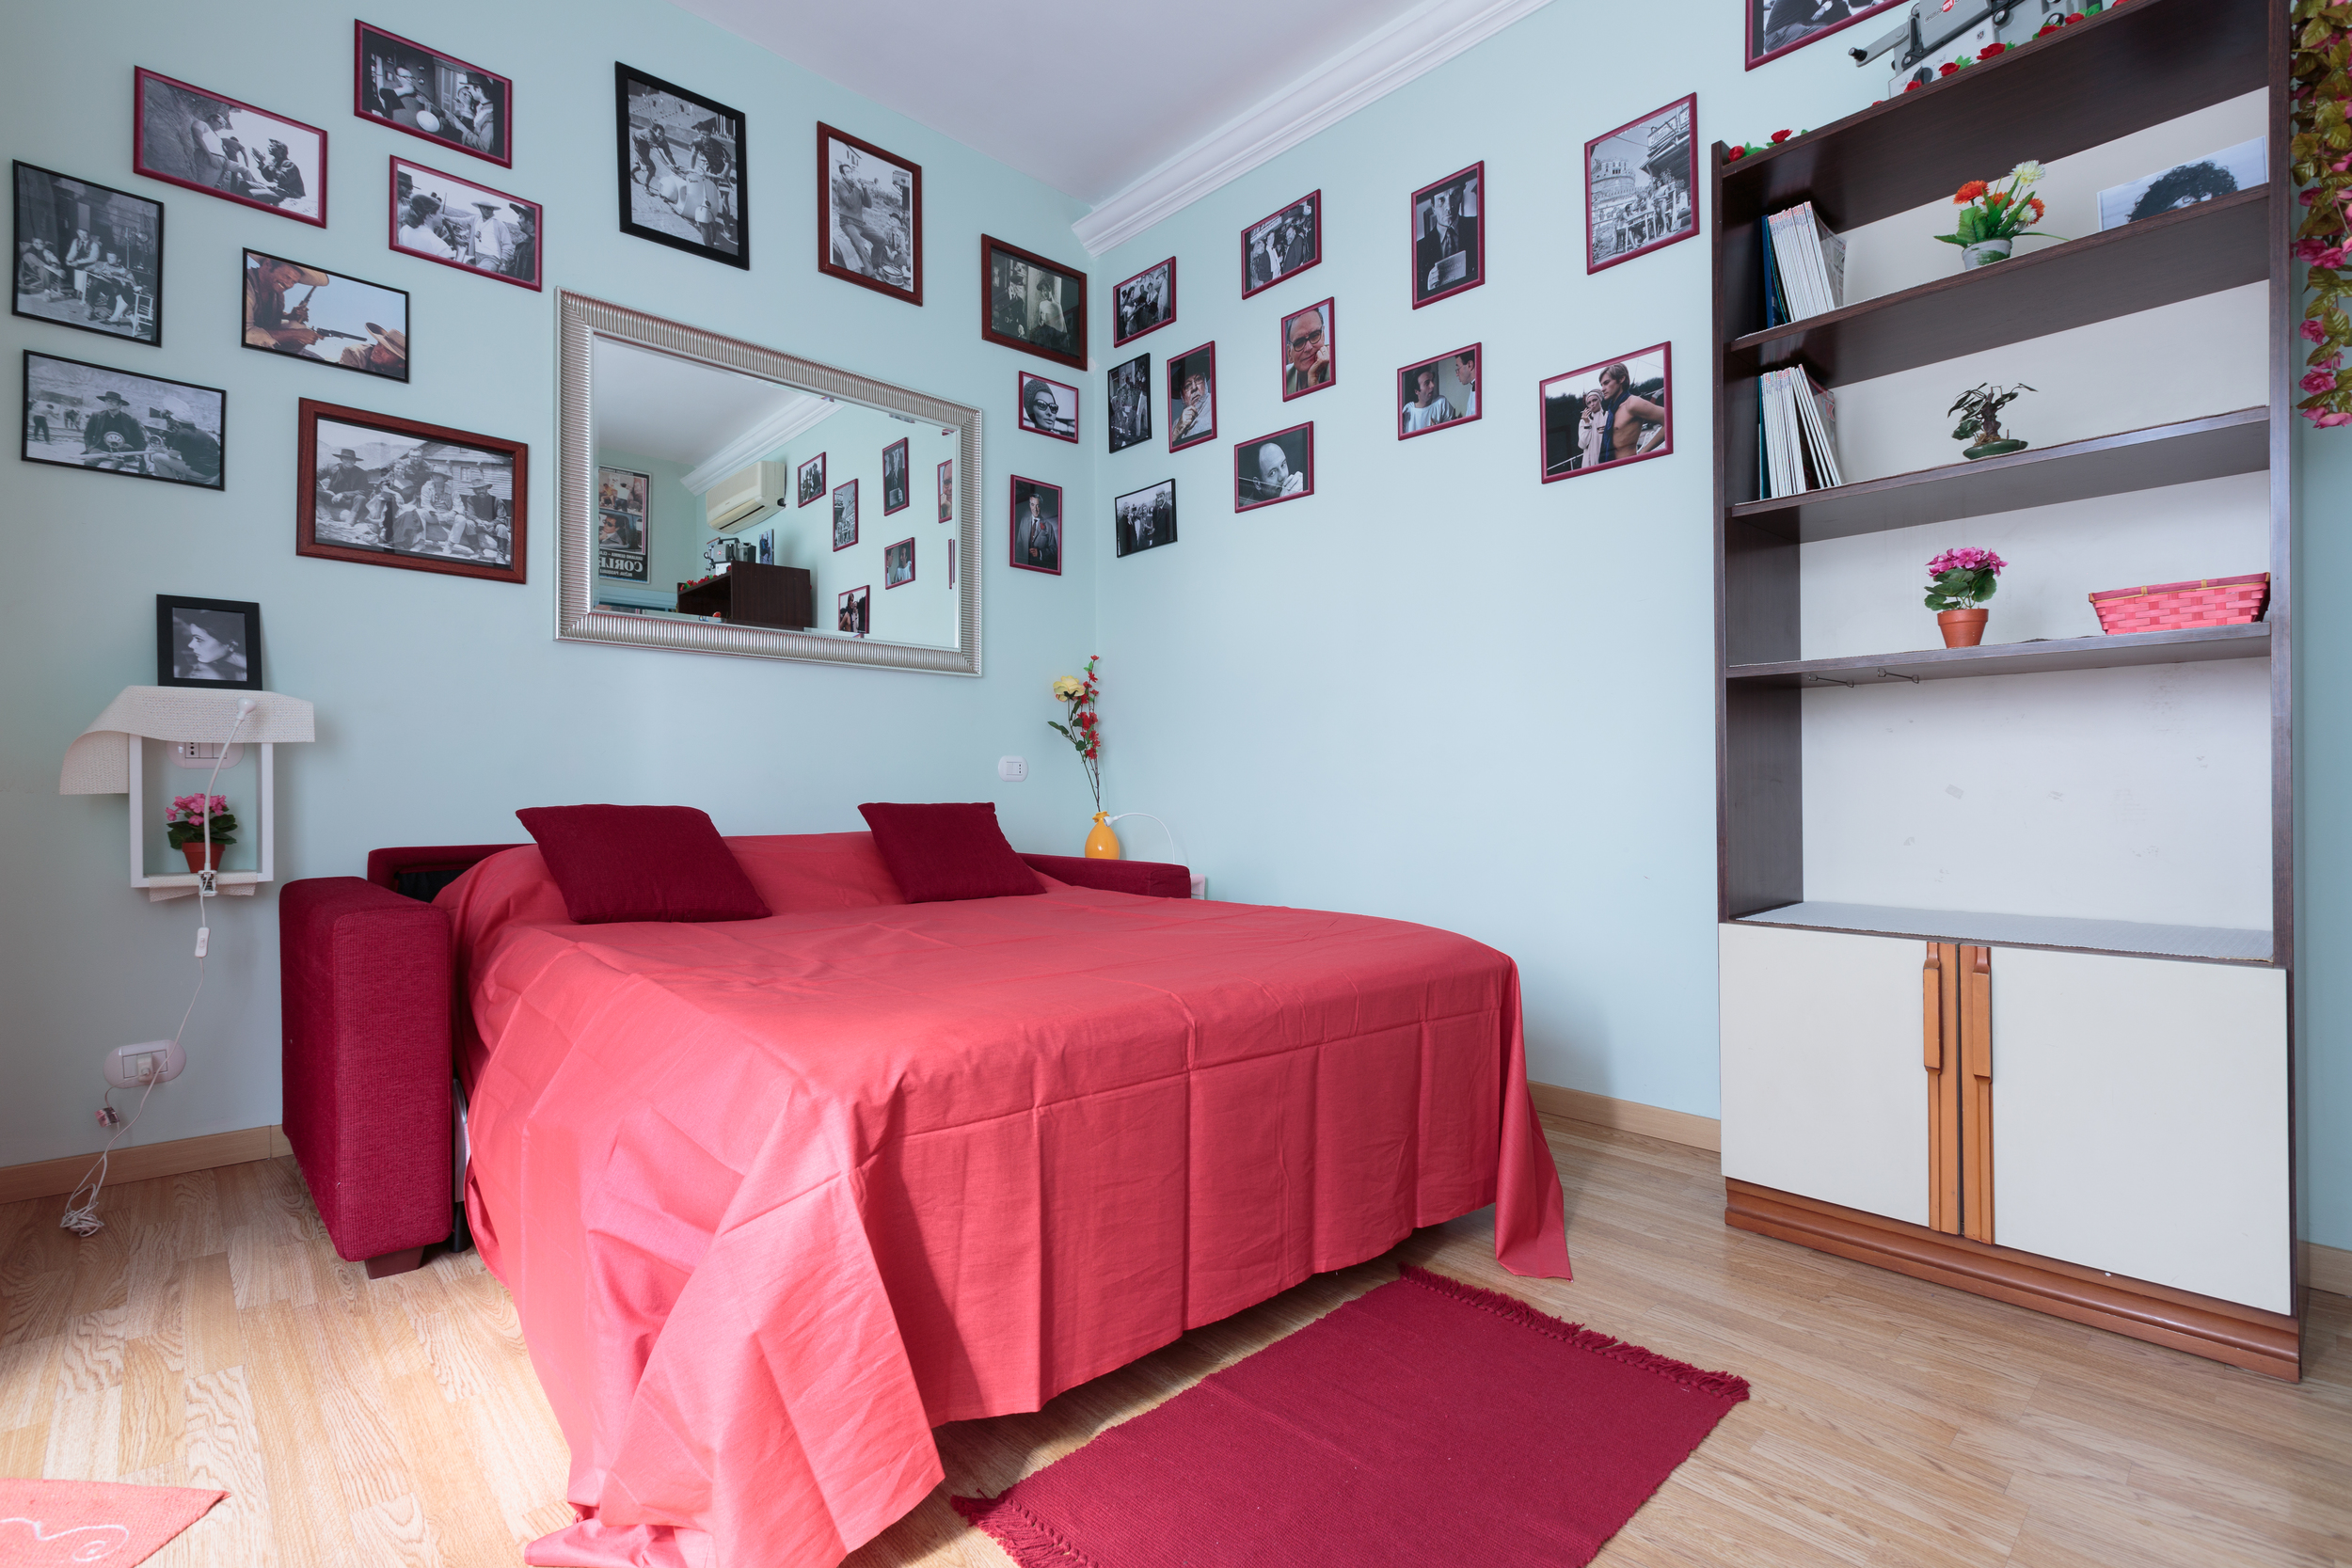 redroom2.jpg